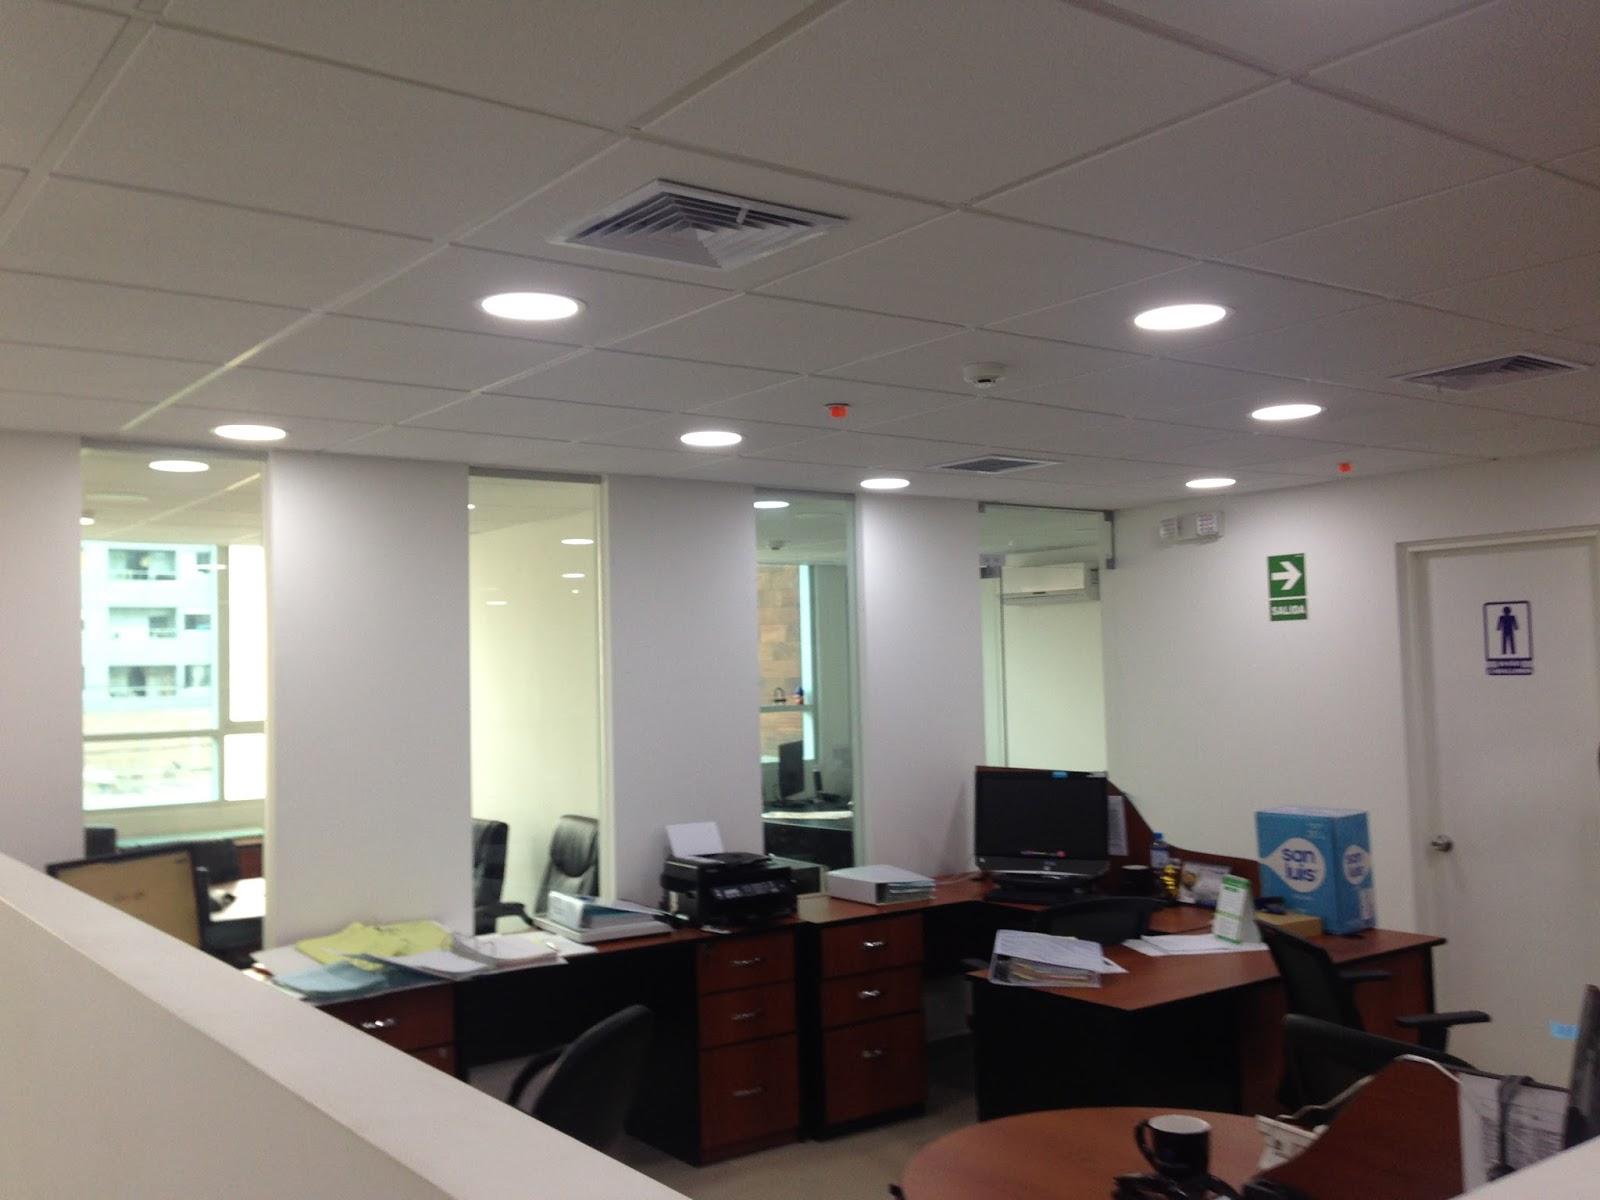 Oniria implementaci n de oficinas de tecnologiatotal s a c for Aire acondicionado oficina